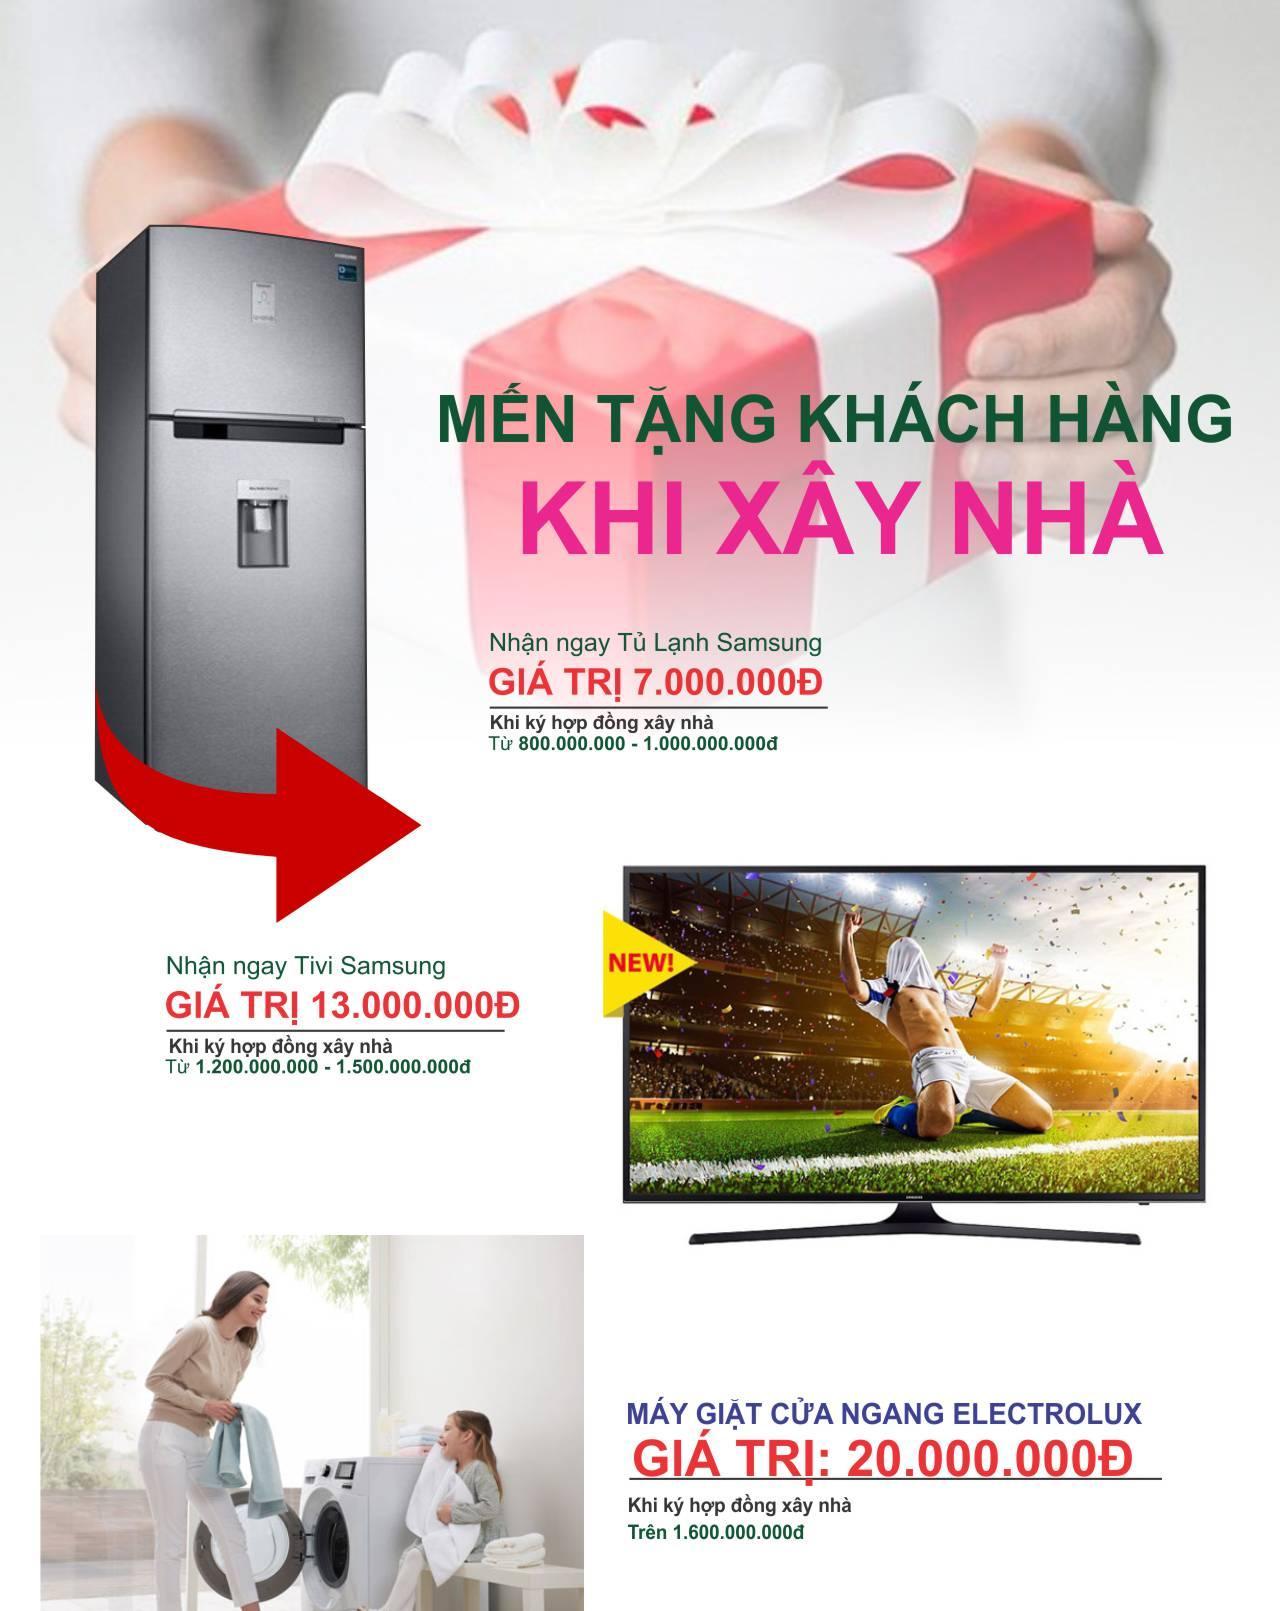 qua-tang-khach-hang xay nha